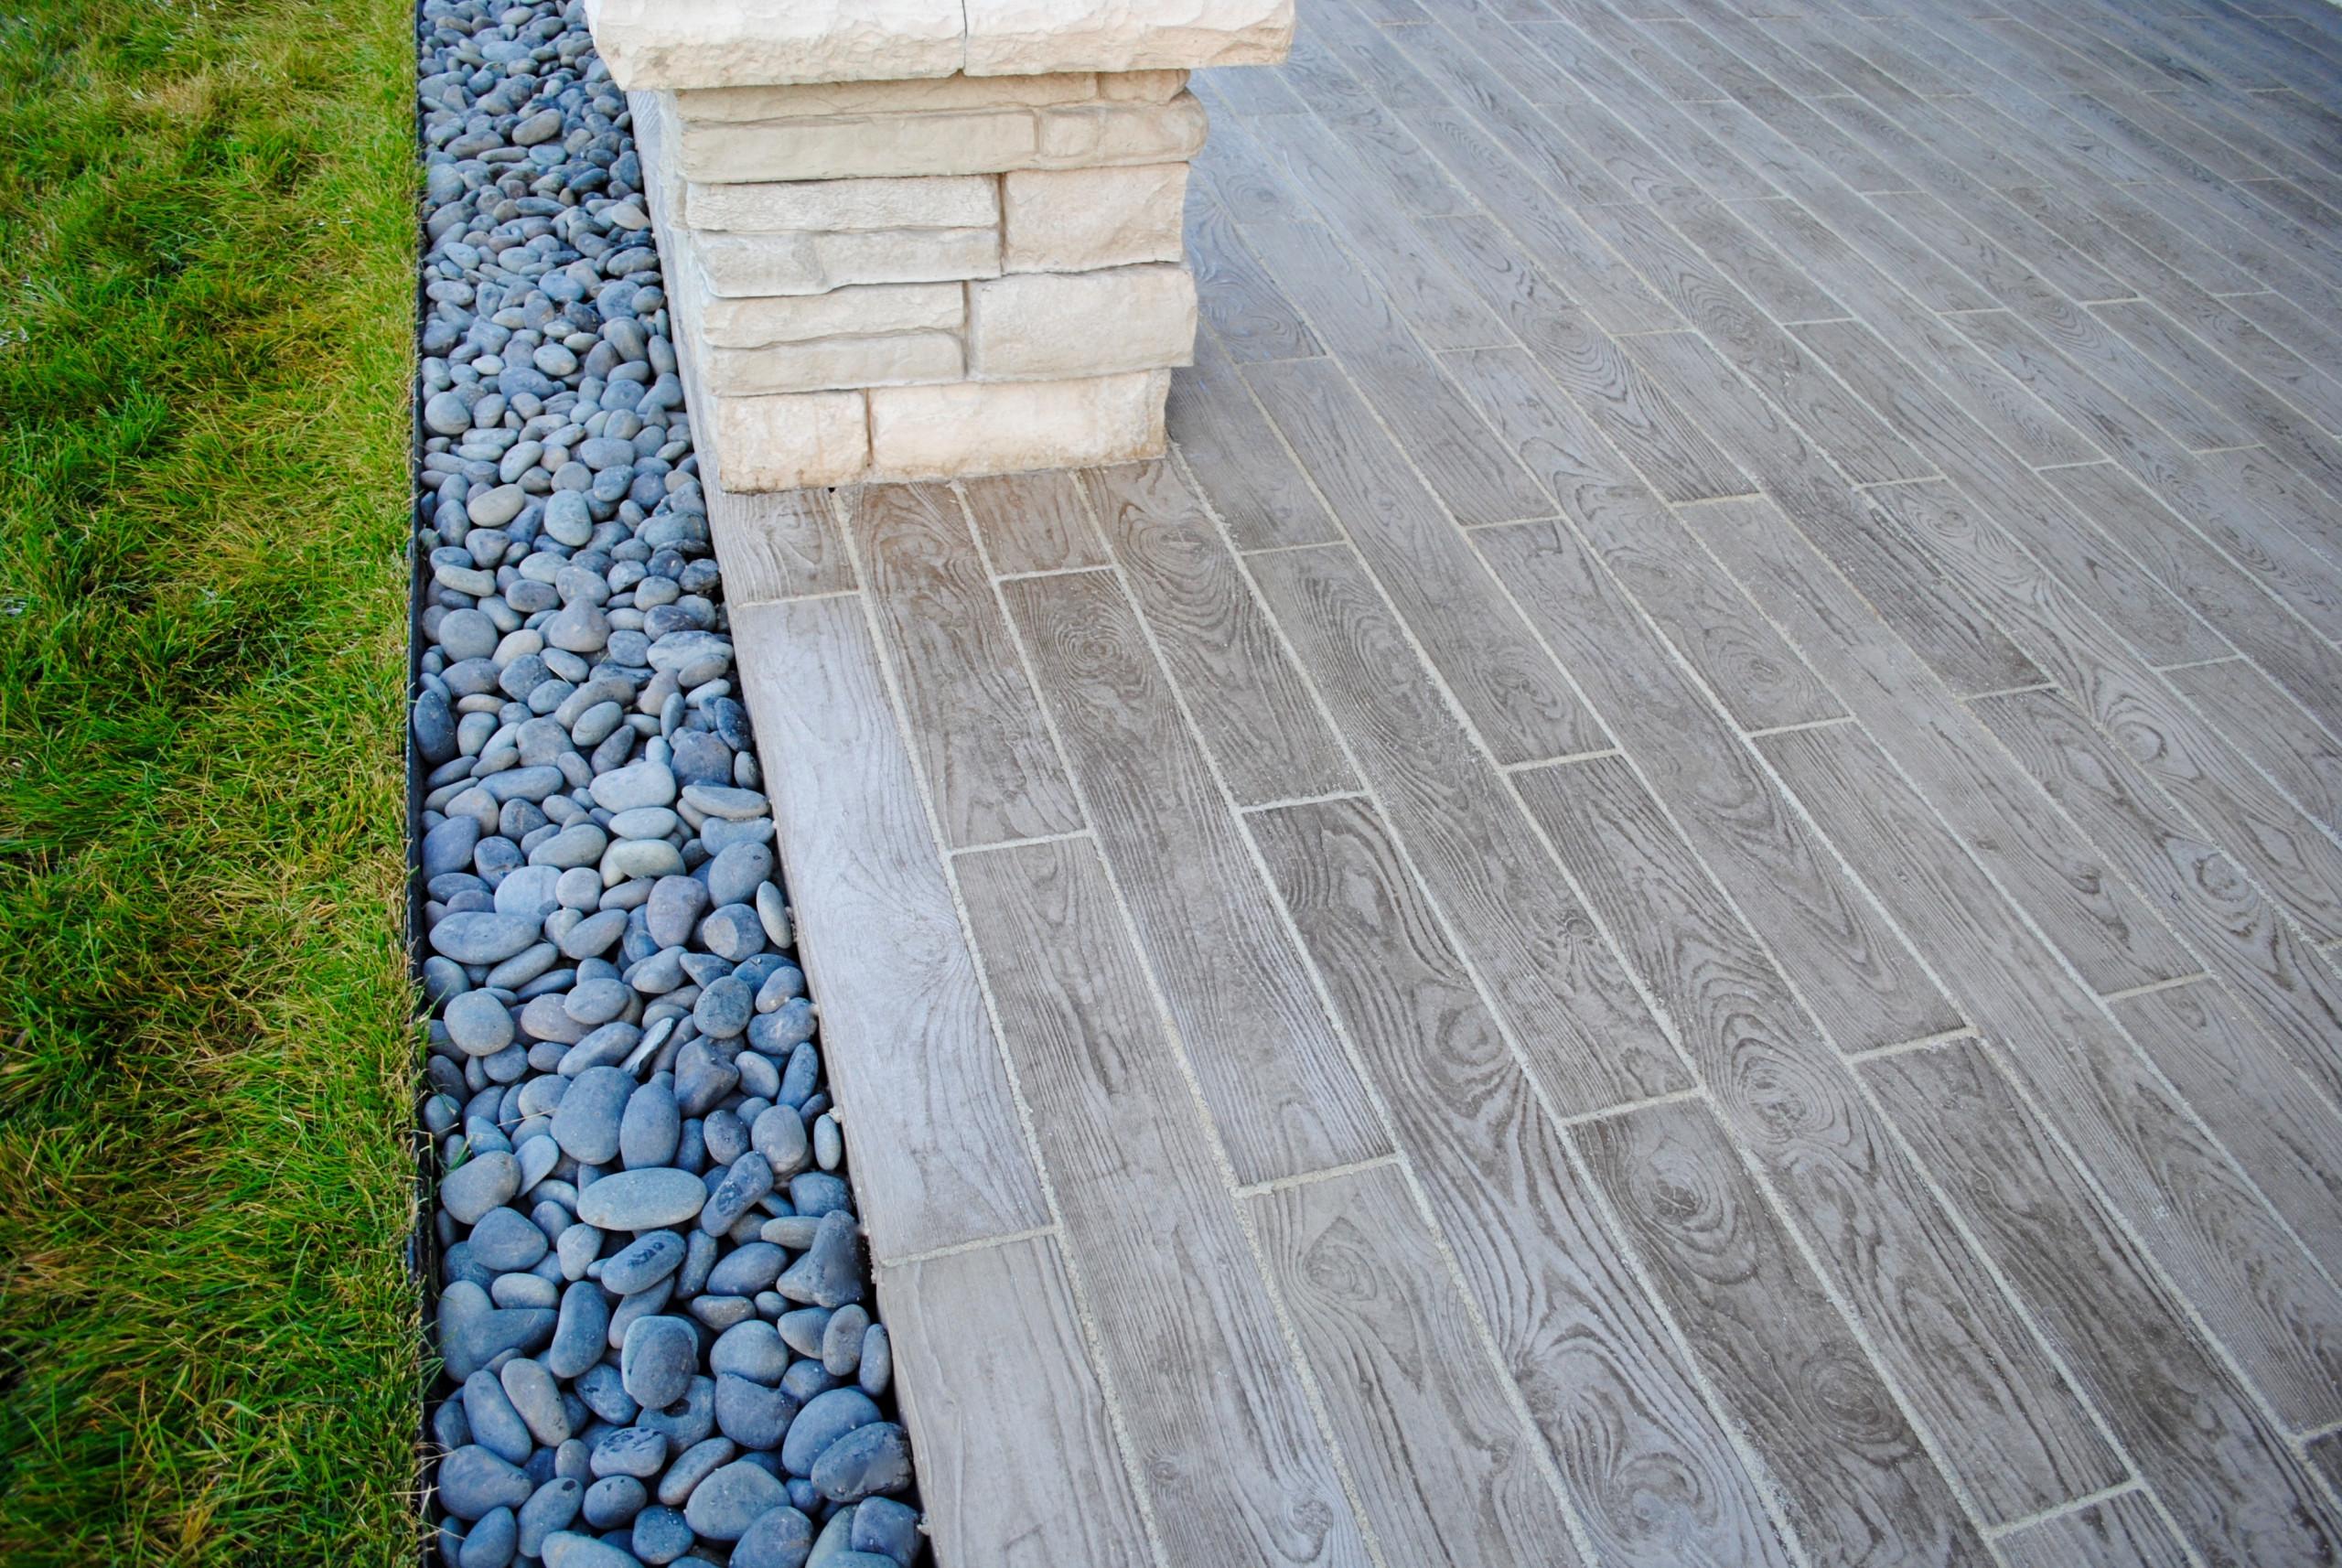 75 Beautiful White Concrete Paver Patio Pictures Ideas September 2020 Houzz